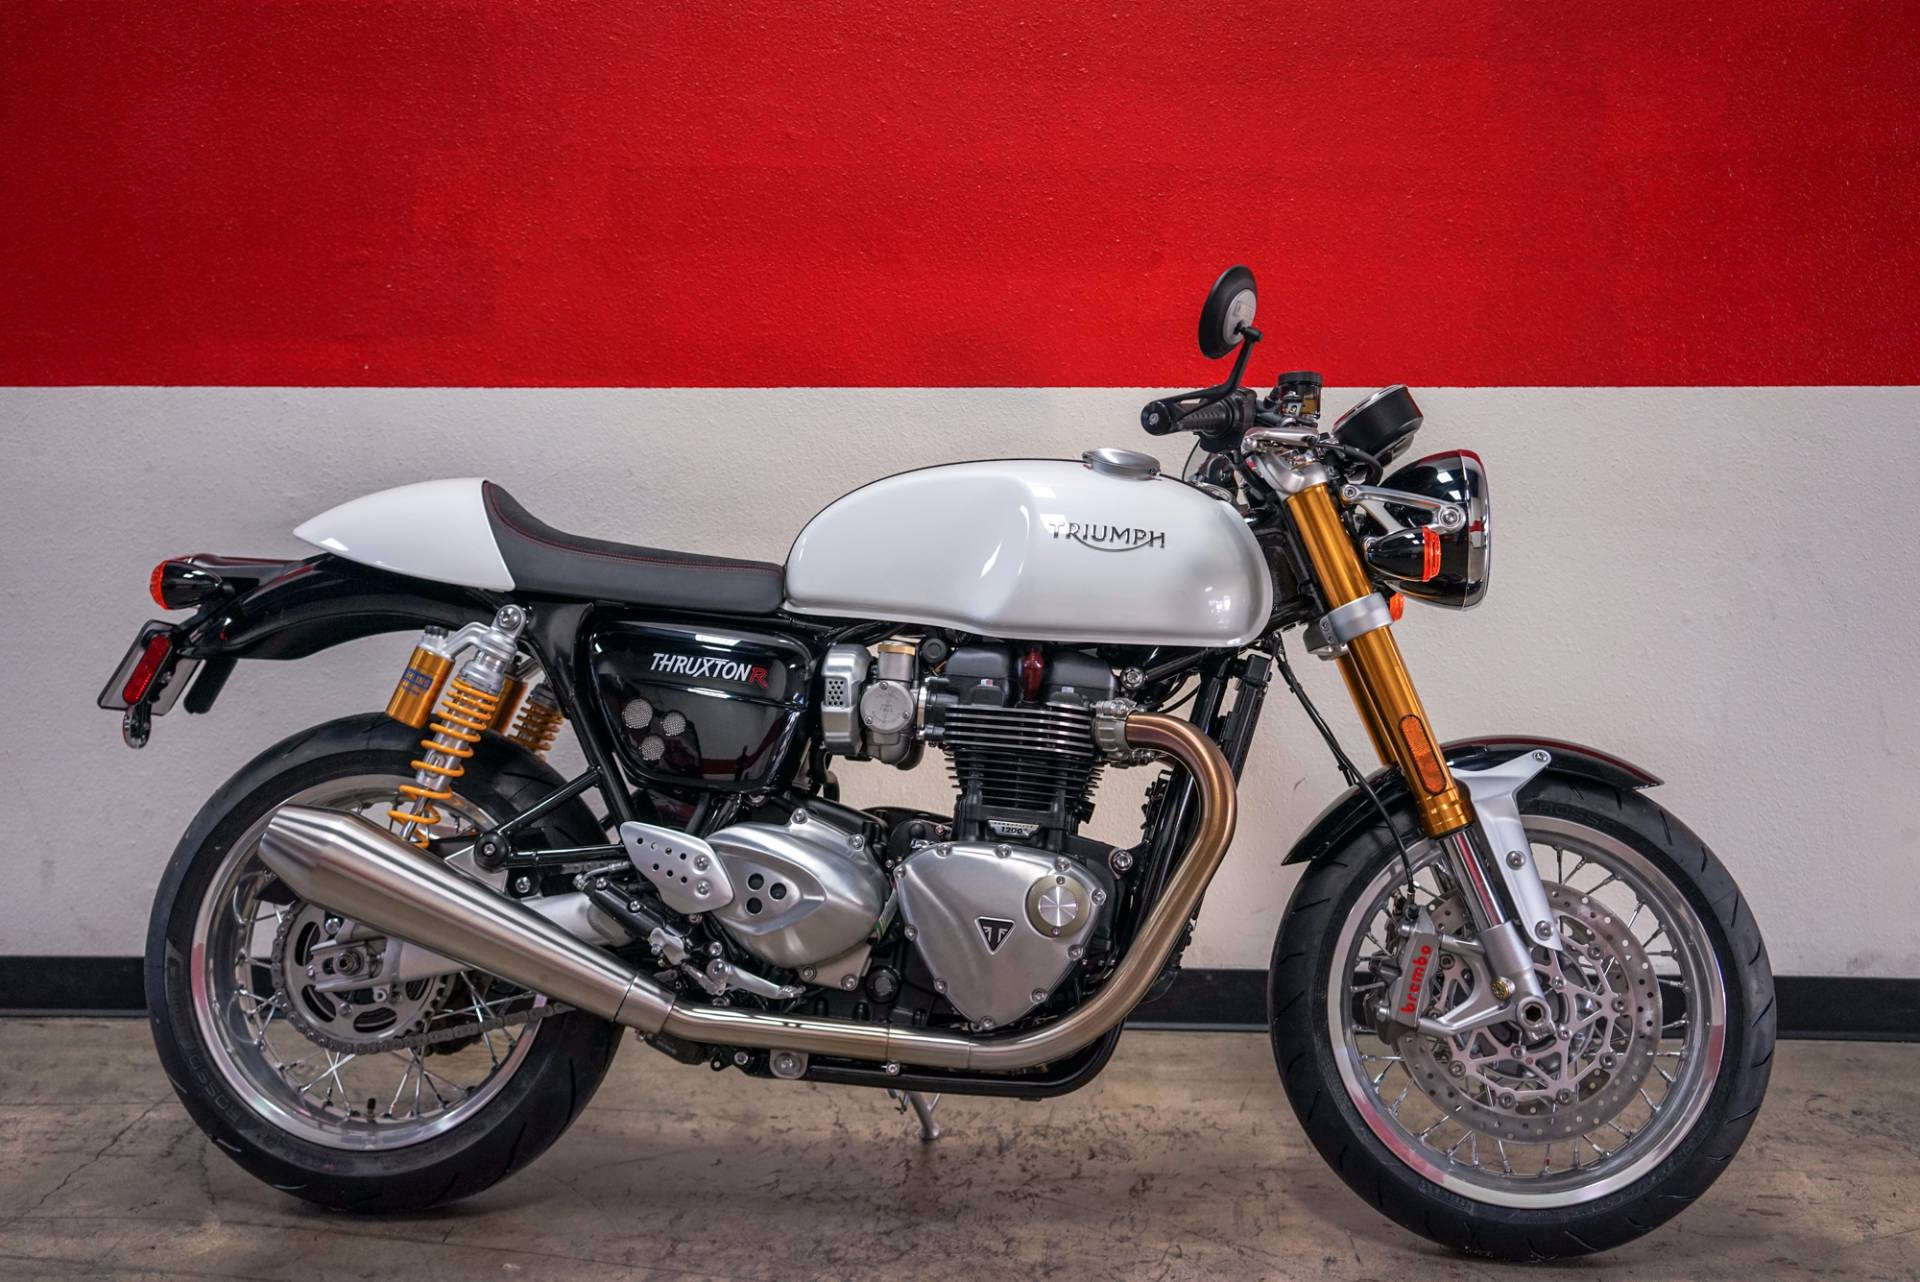 new 2018 triumph thruxton 1200 r motorcycles in brea ca. Black Bedroom Furniture Sets. Home Design Ideas